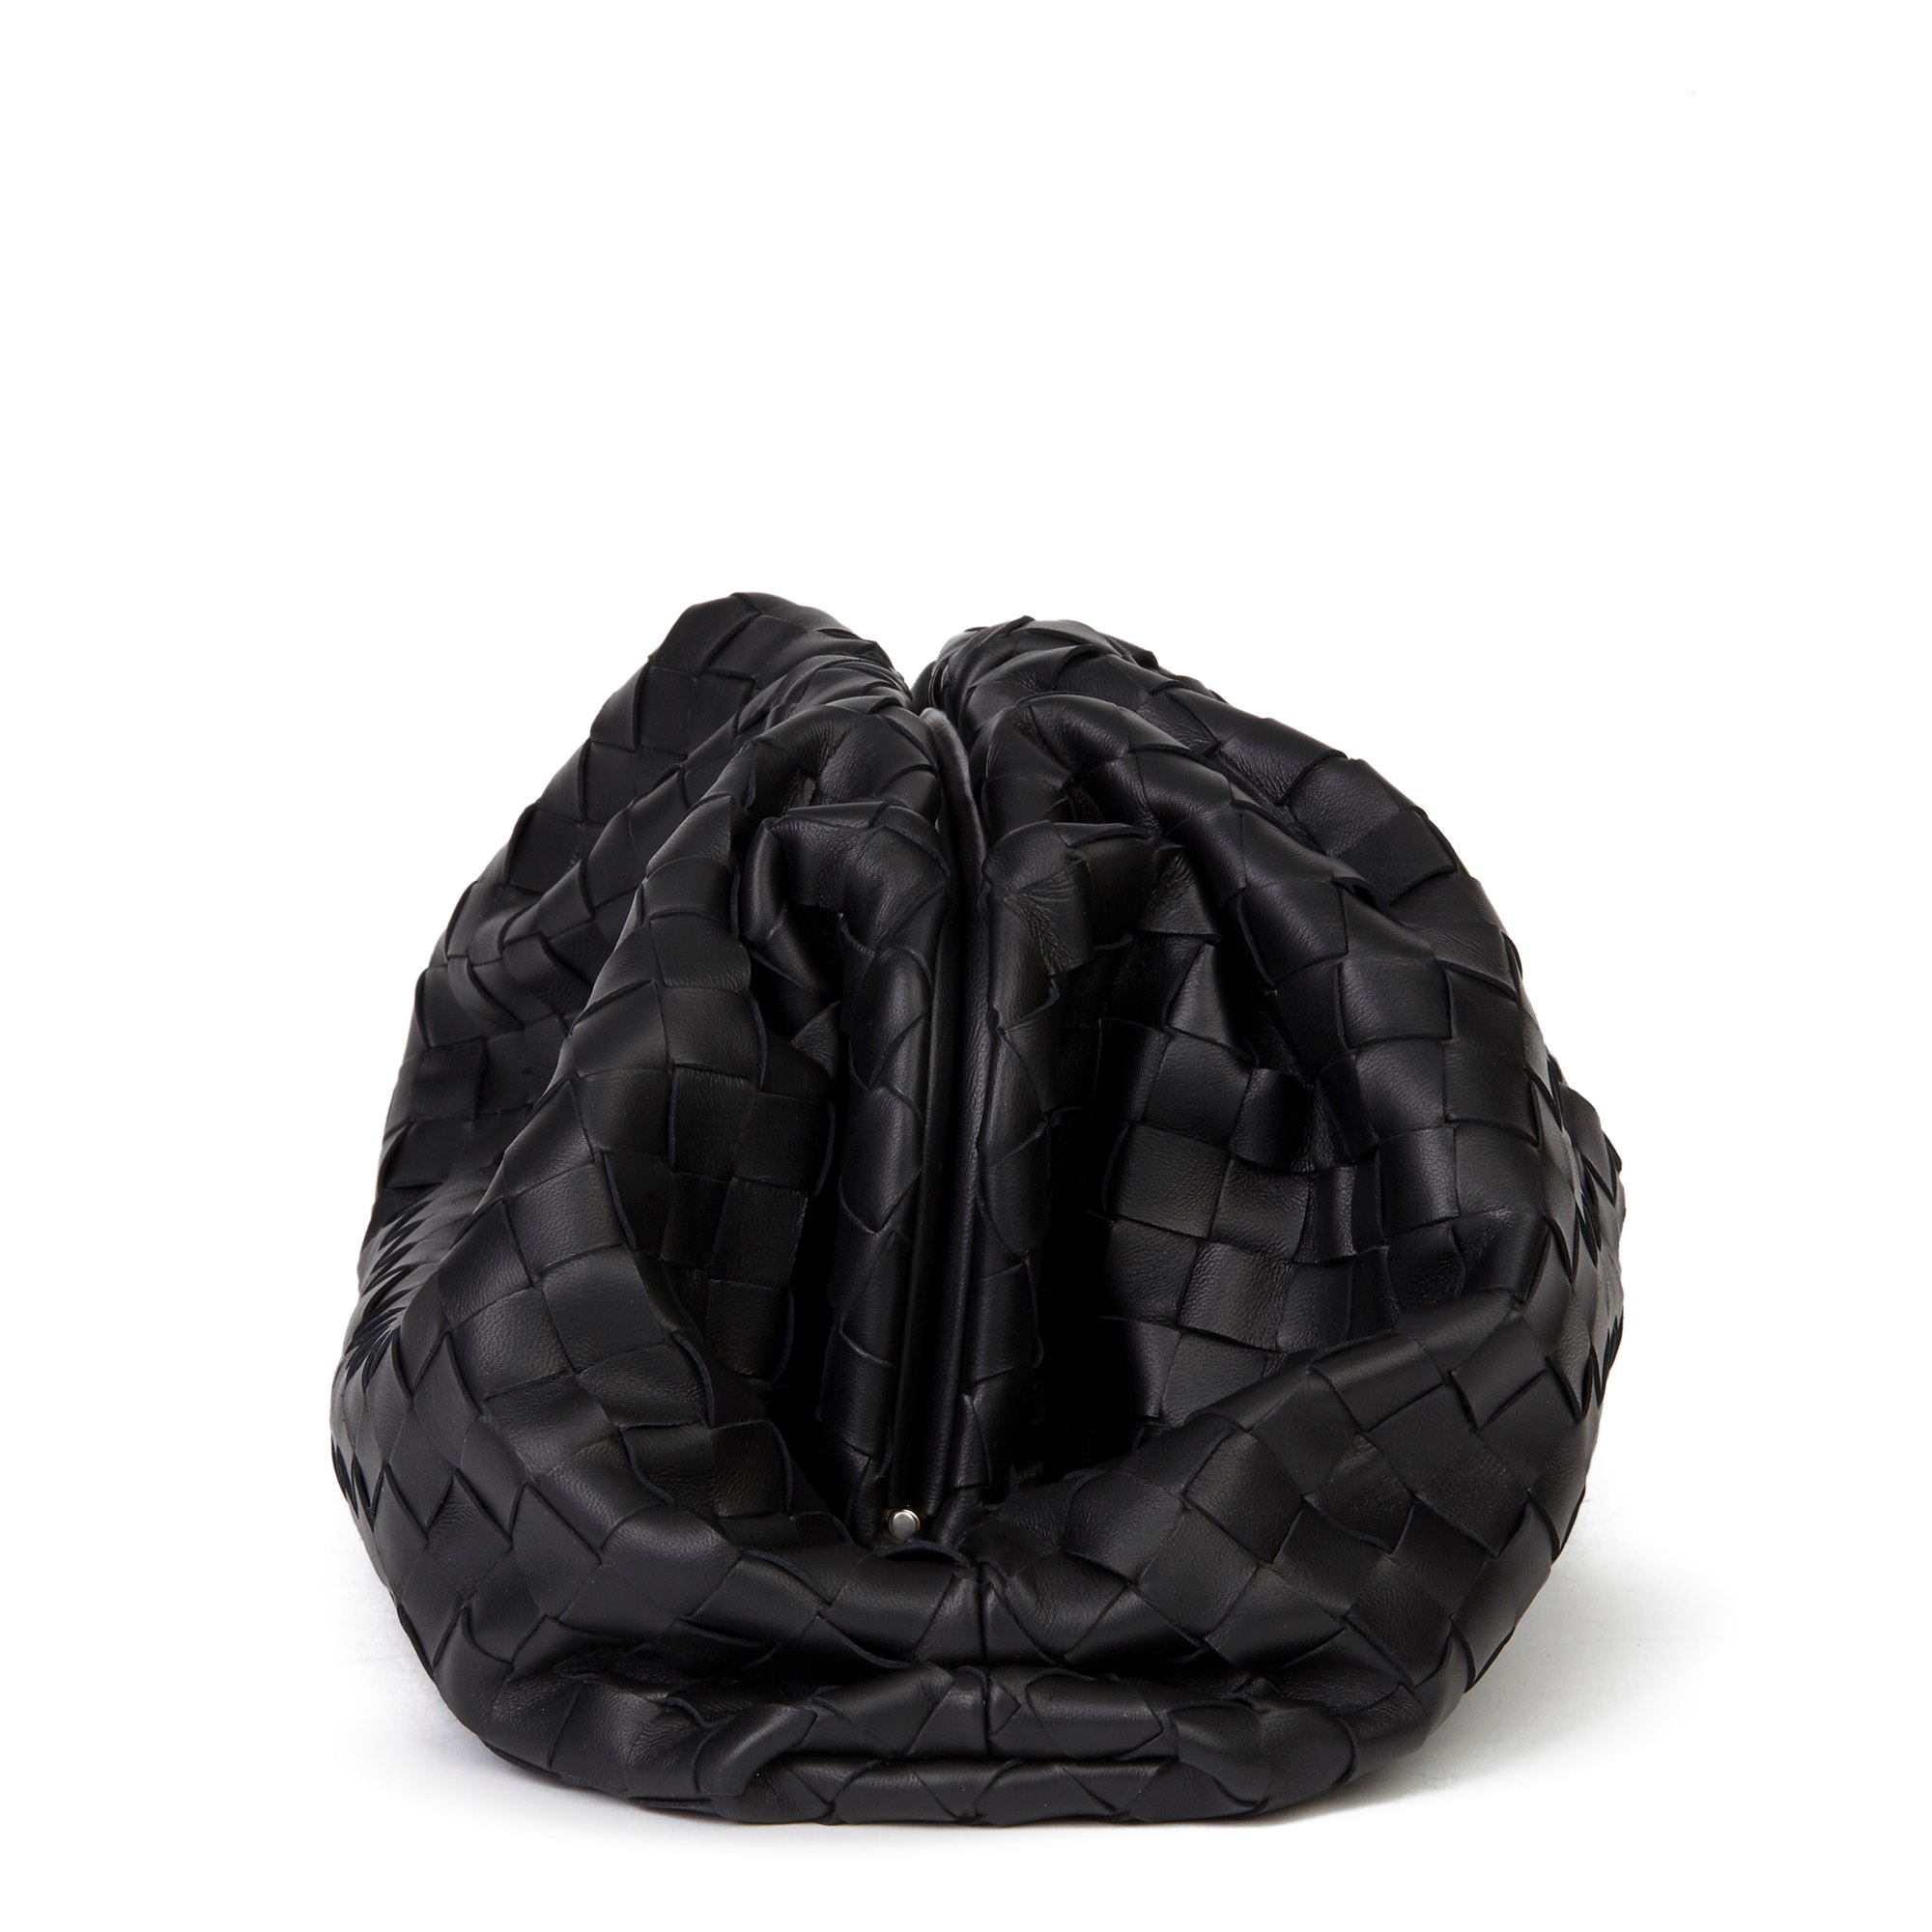 Bottega Veneta Black Woven Lambskin The Pouch